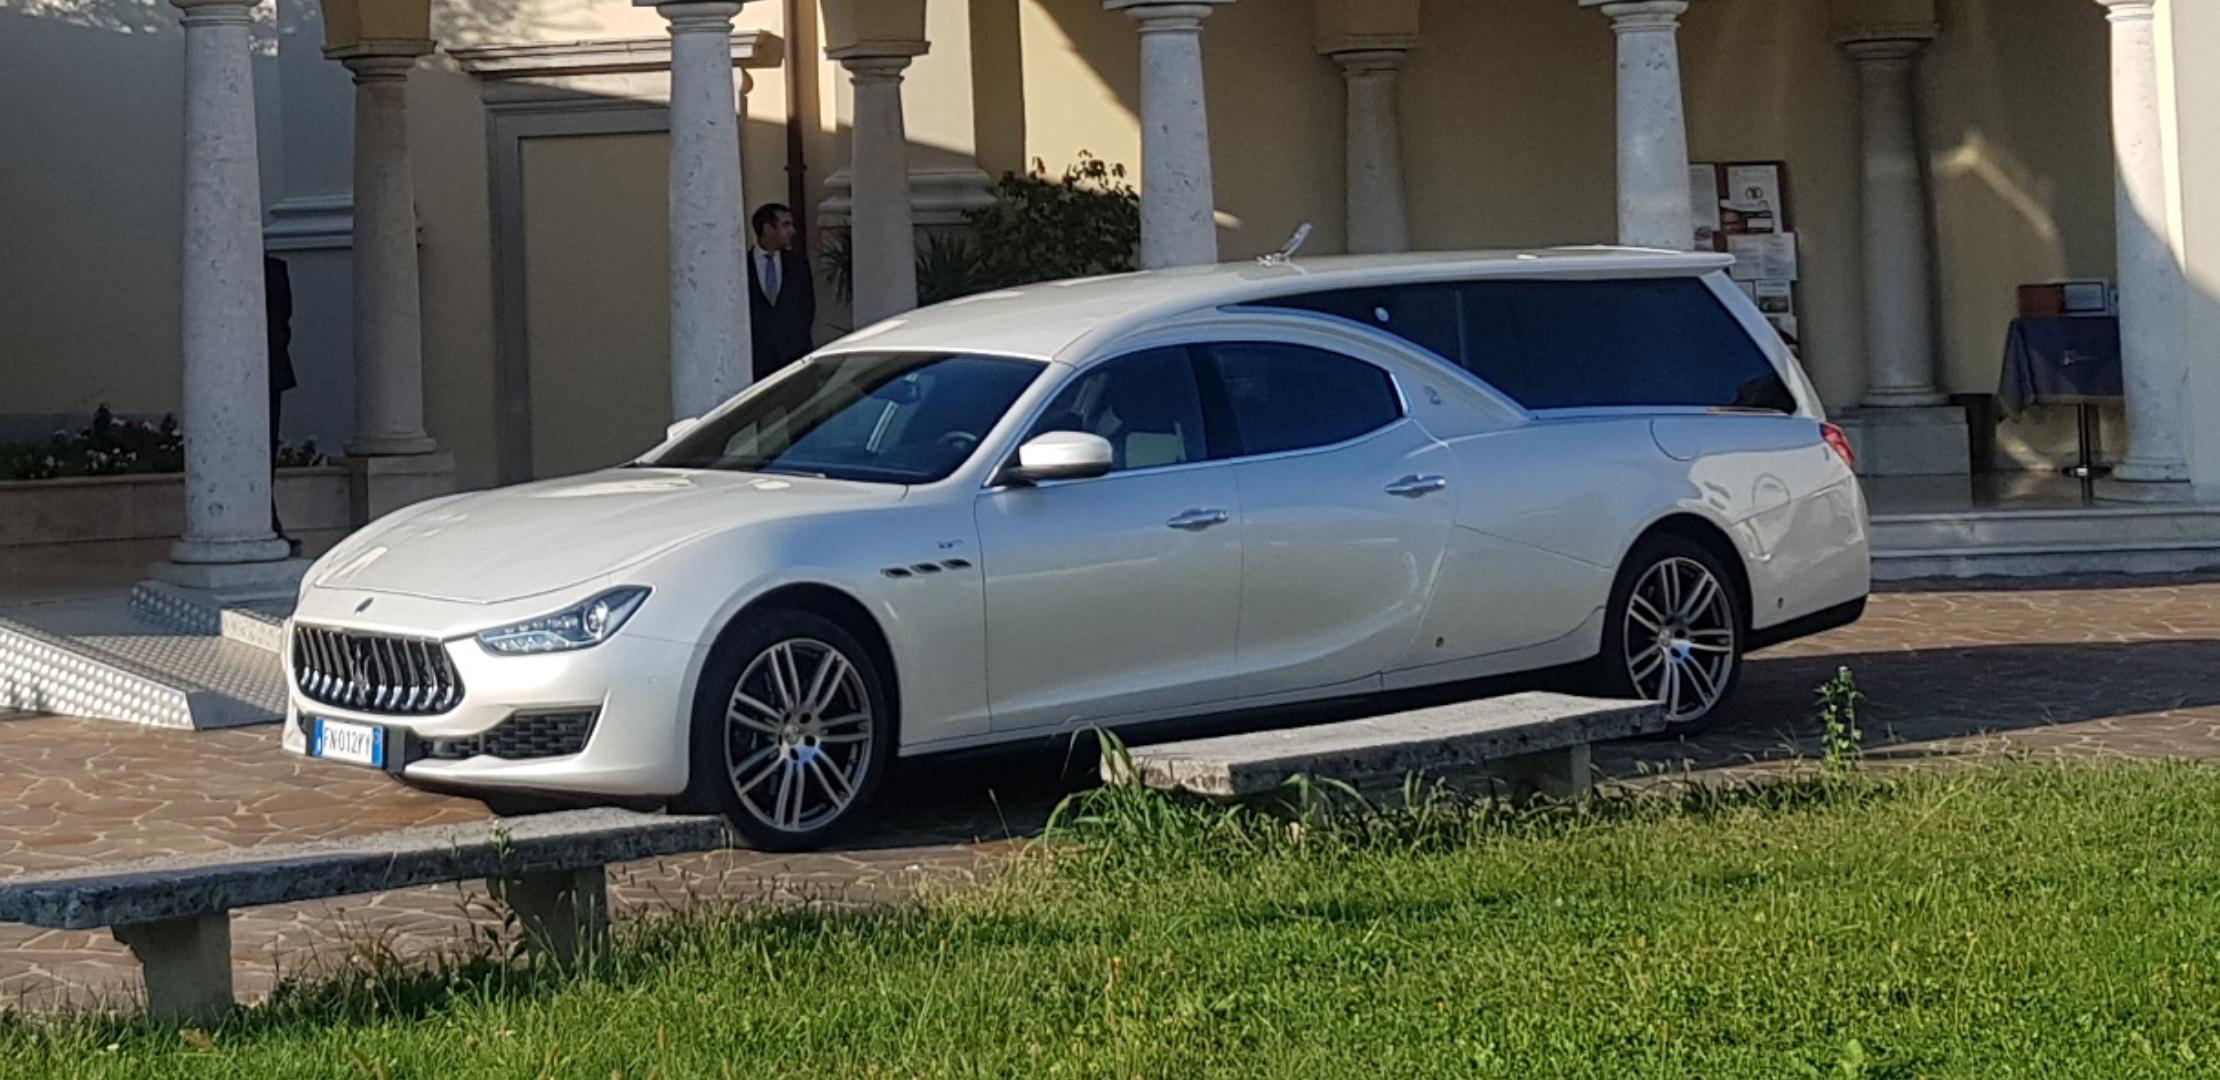 Maserati ghibli pax eterna udine autofun